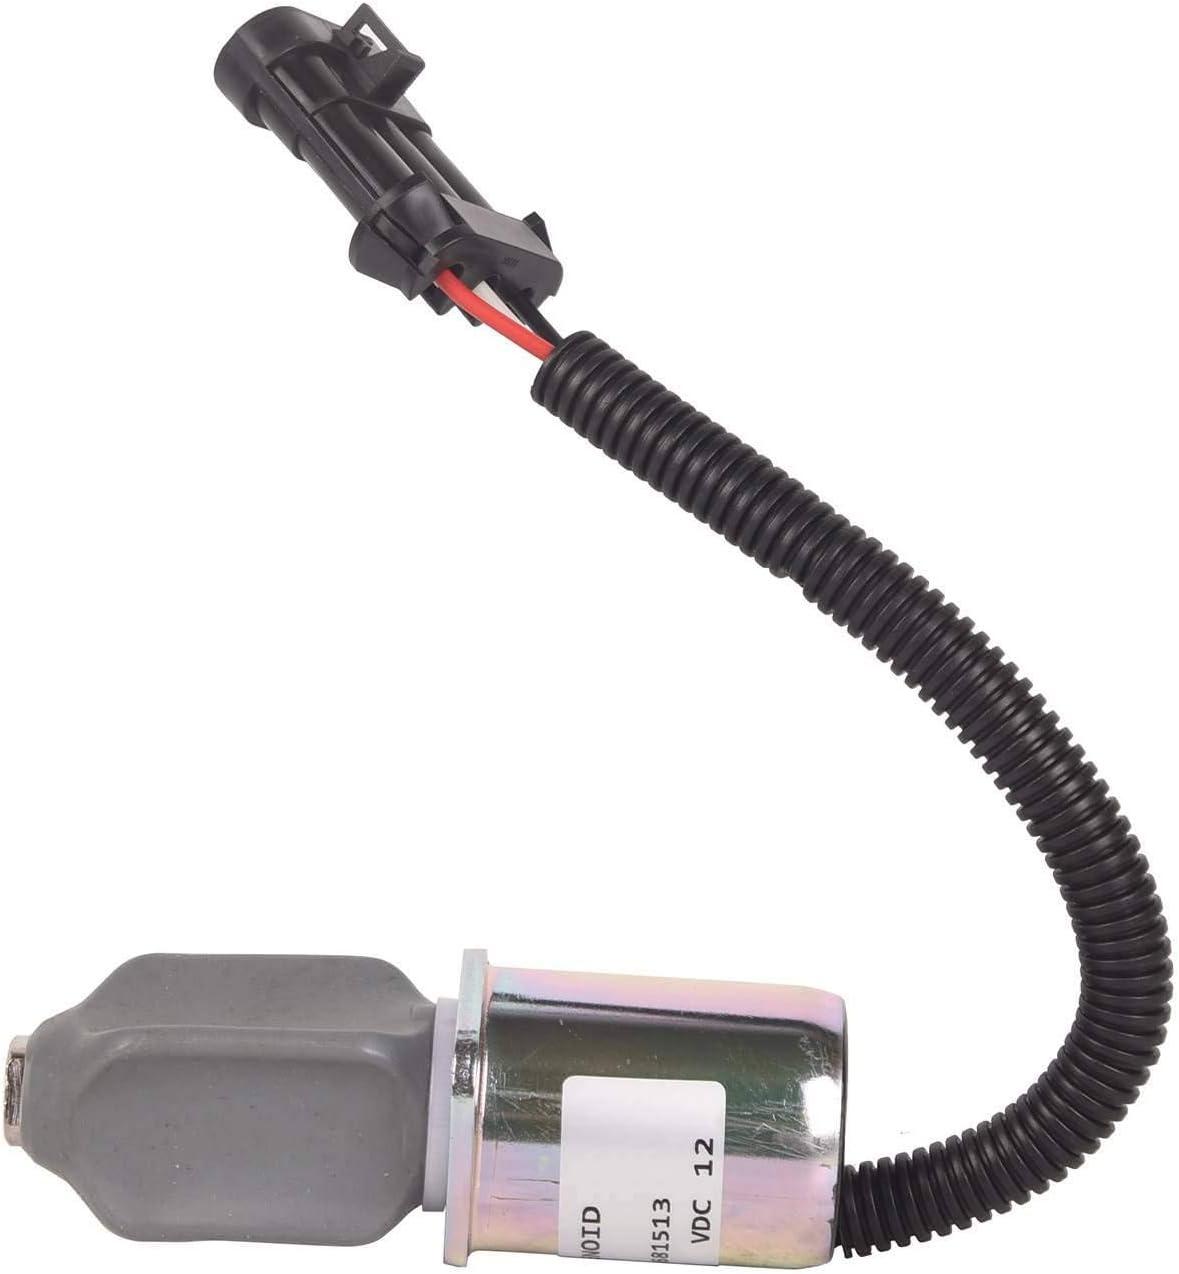 TOPAZ Fuel Weekly update Limited price Shut Off Solenoid 6681513 for Skid Fit Kubota Bobcat